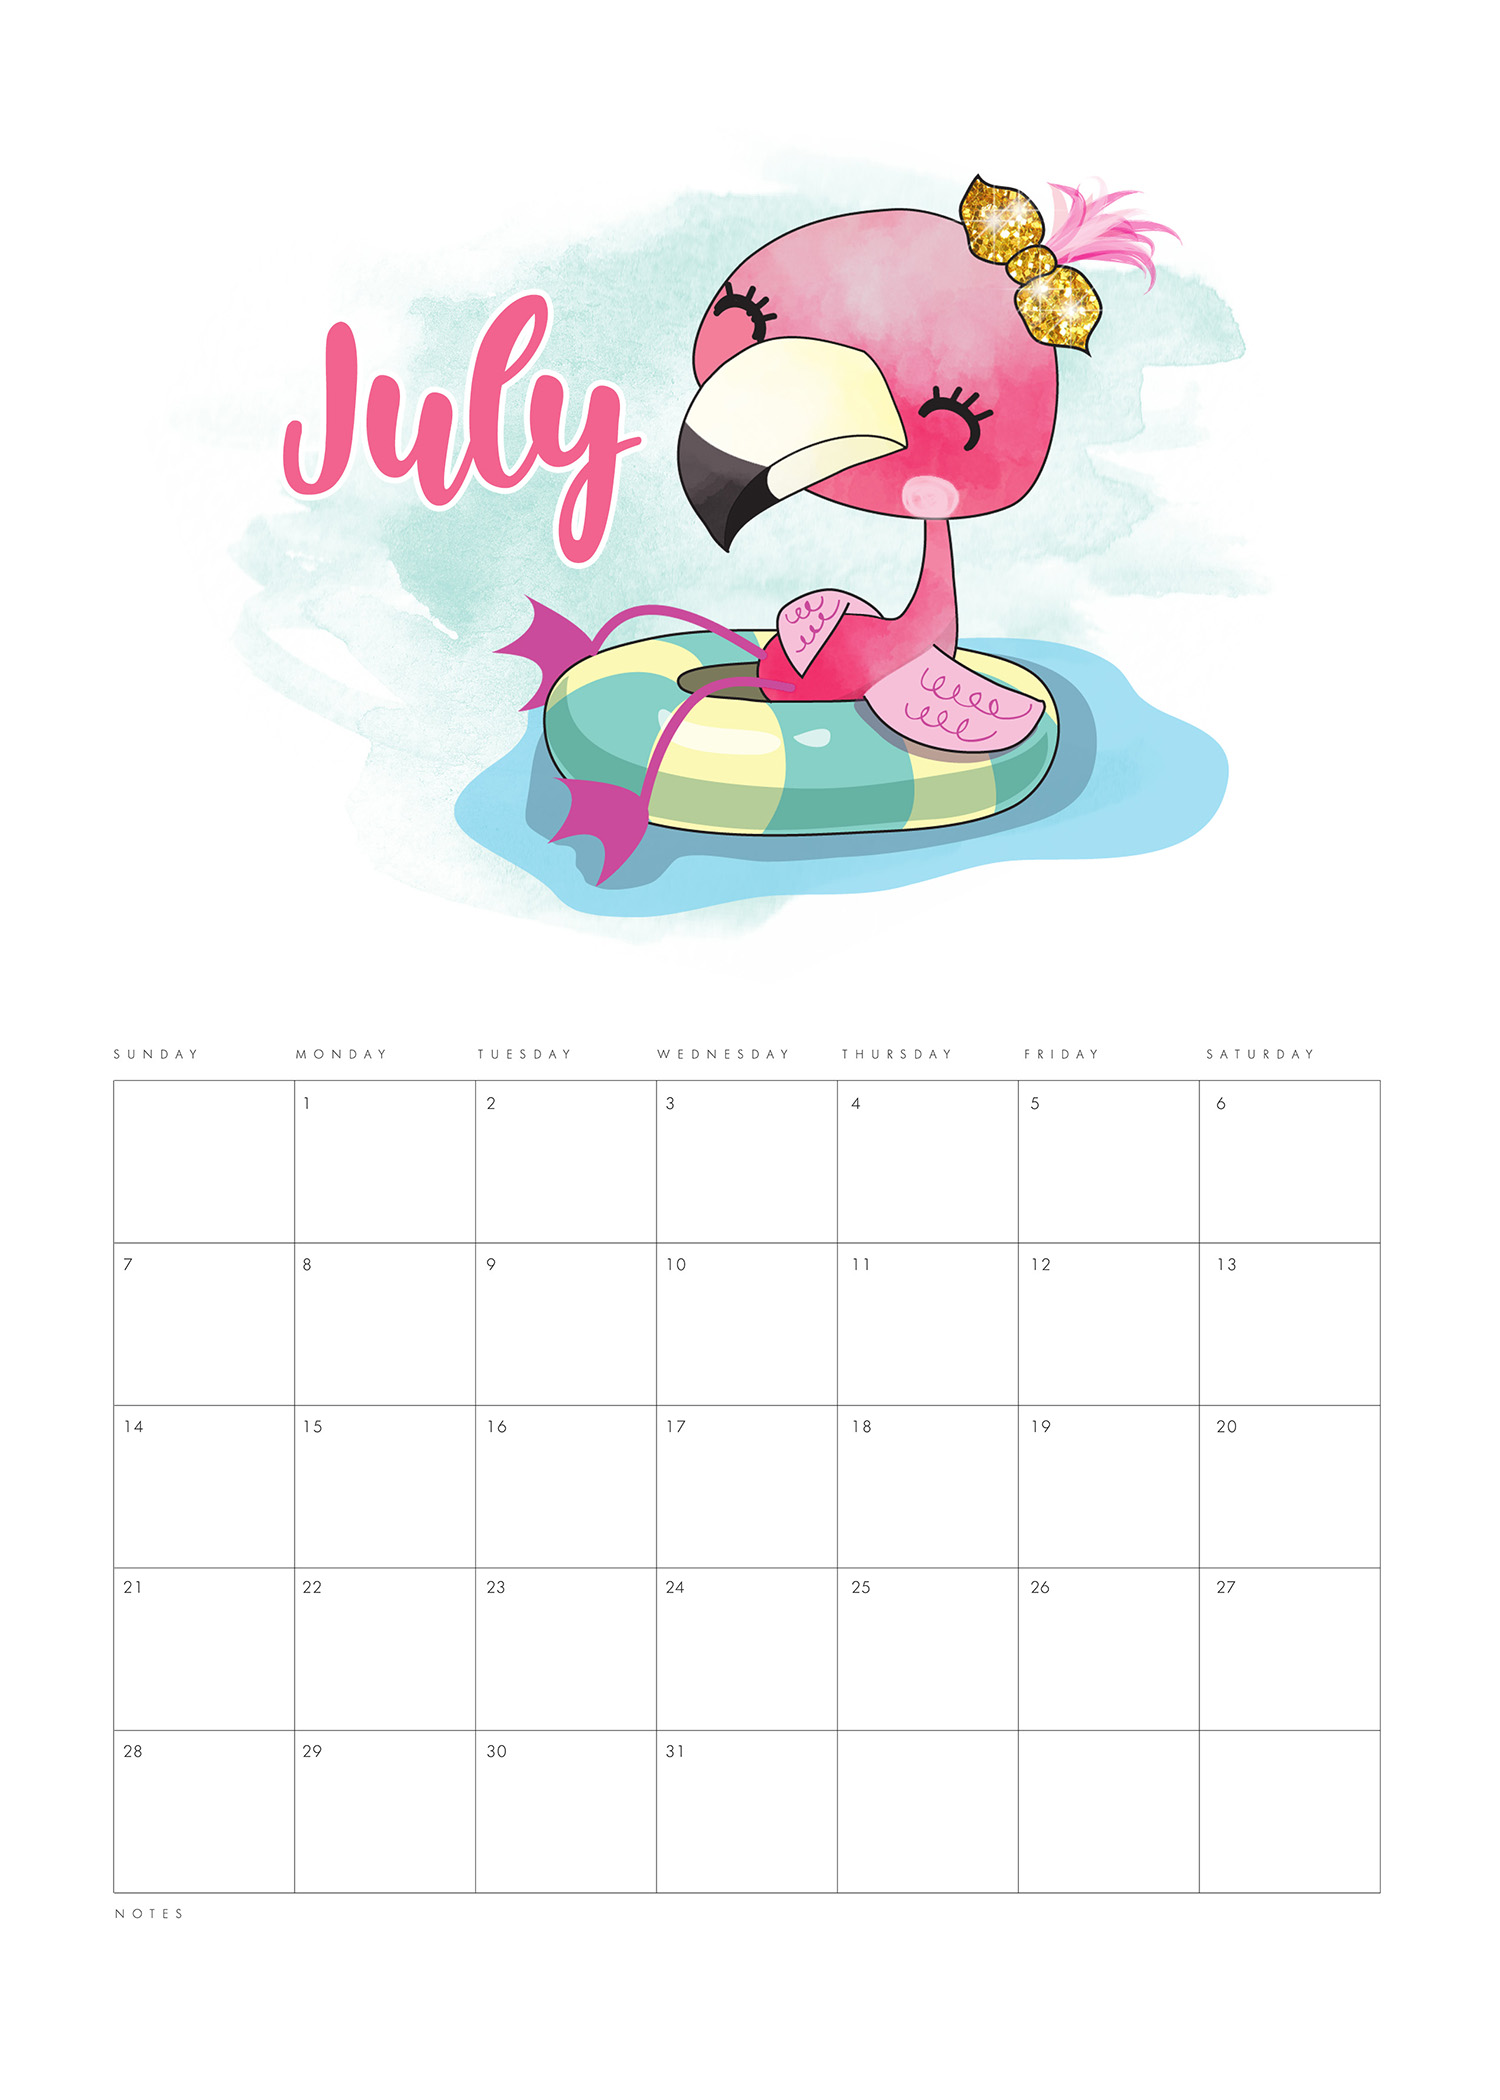 Free Printable 2019 Funny Flamingo Calendar - The Cottage ...